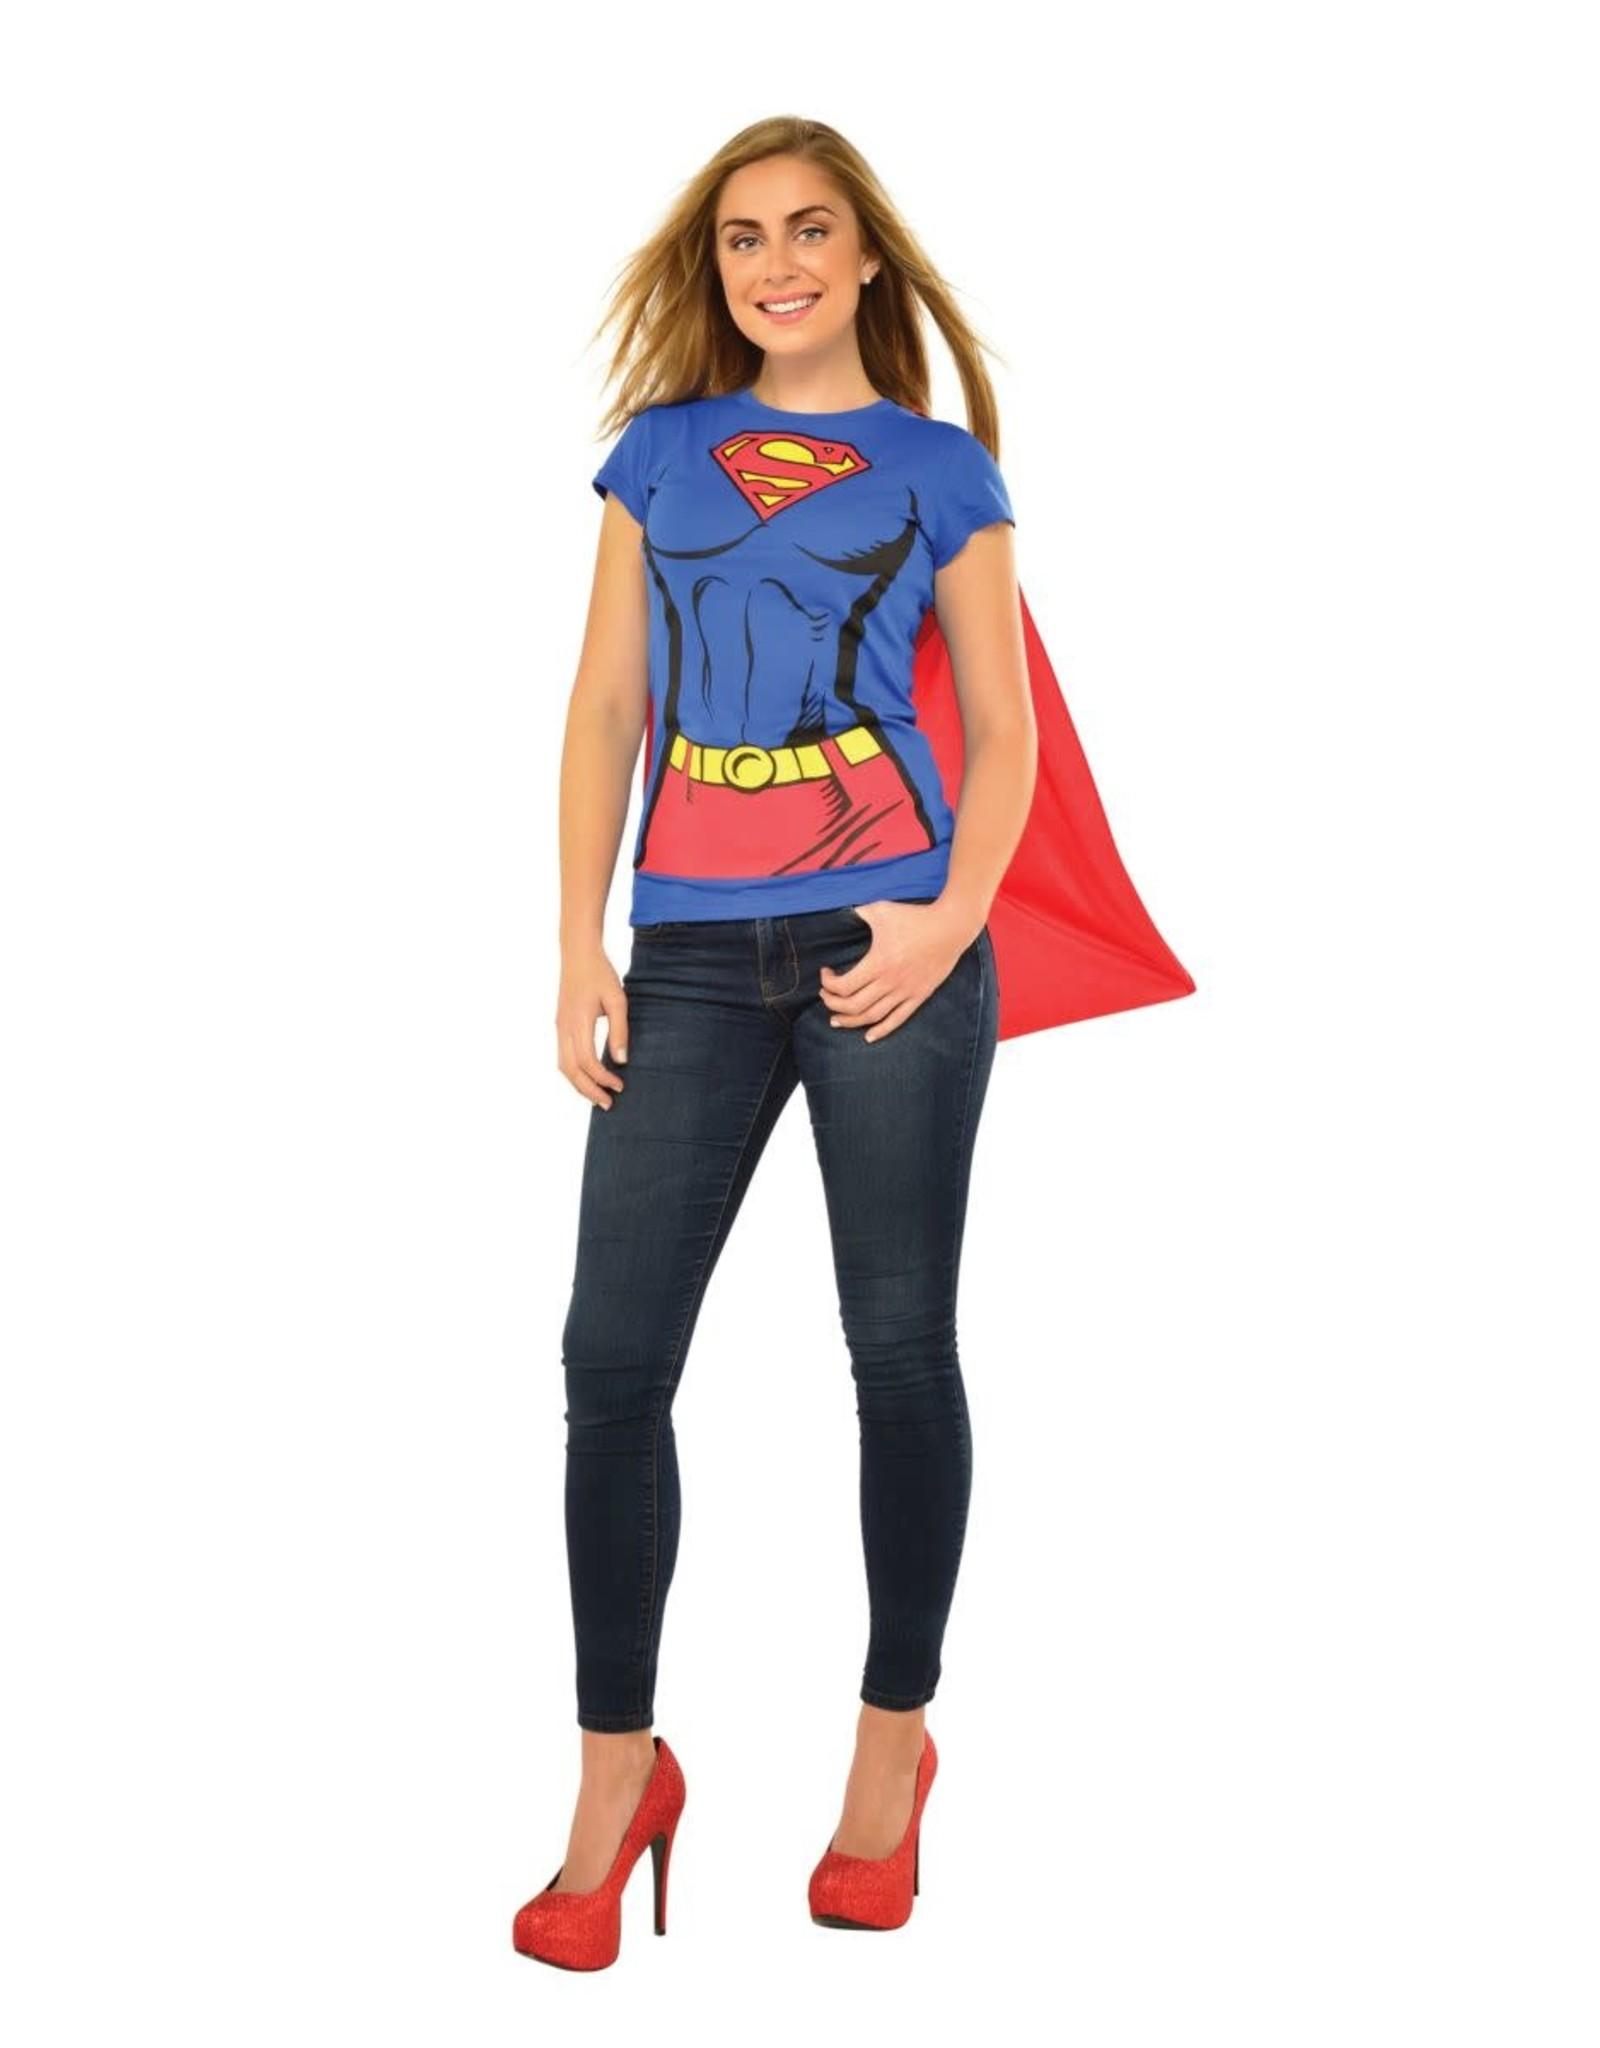 Rubies Costume Supergirl T-Shirt w/Cape